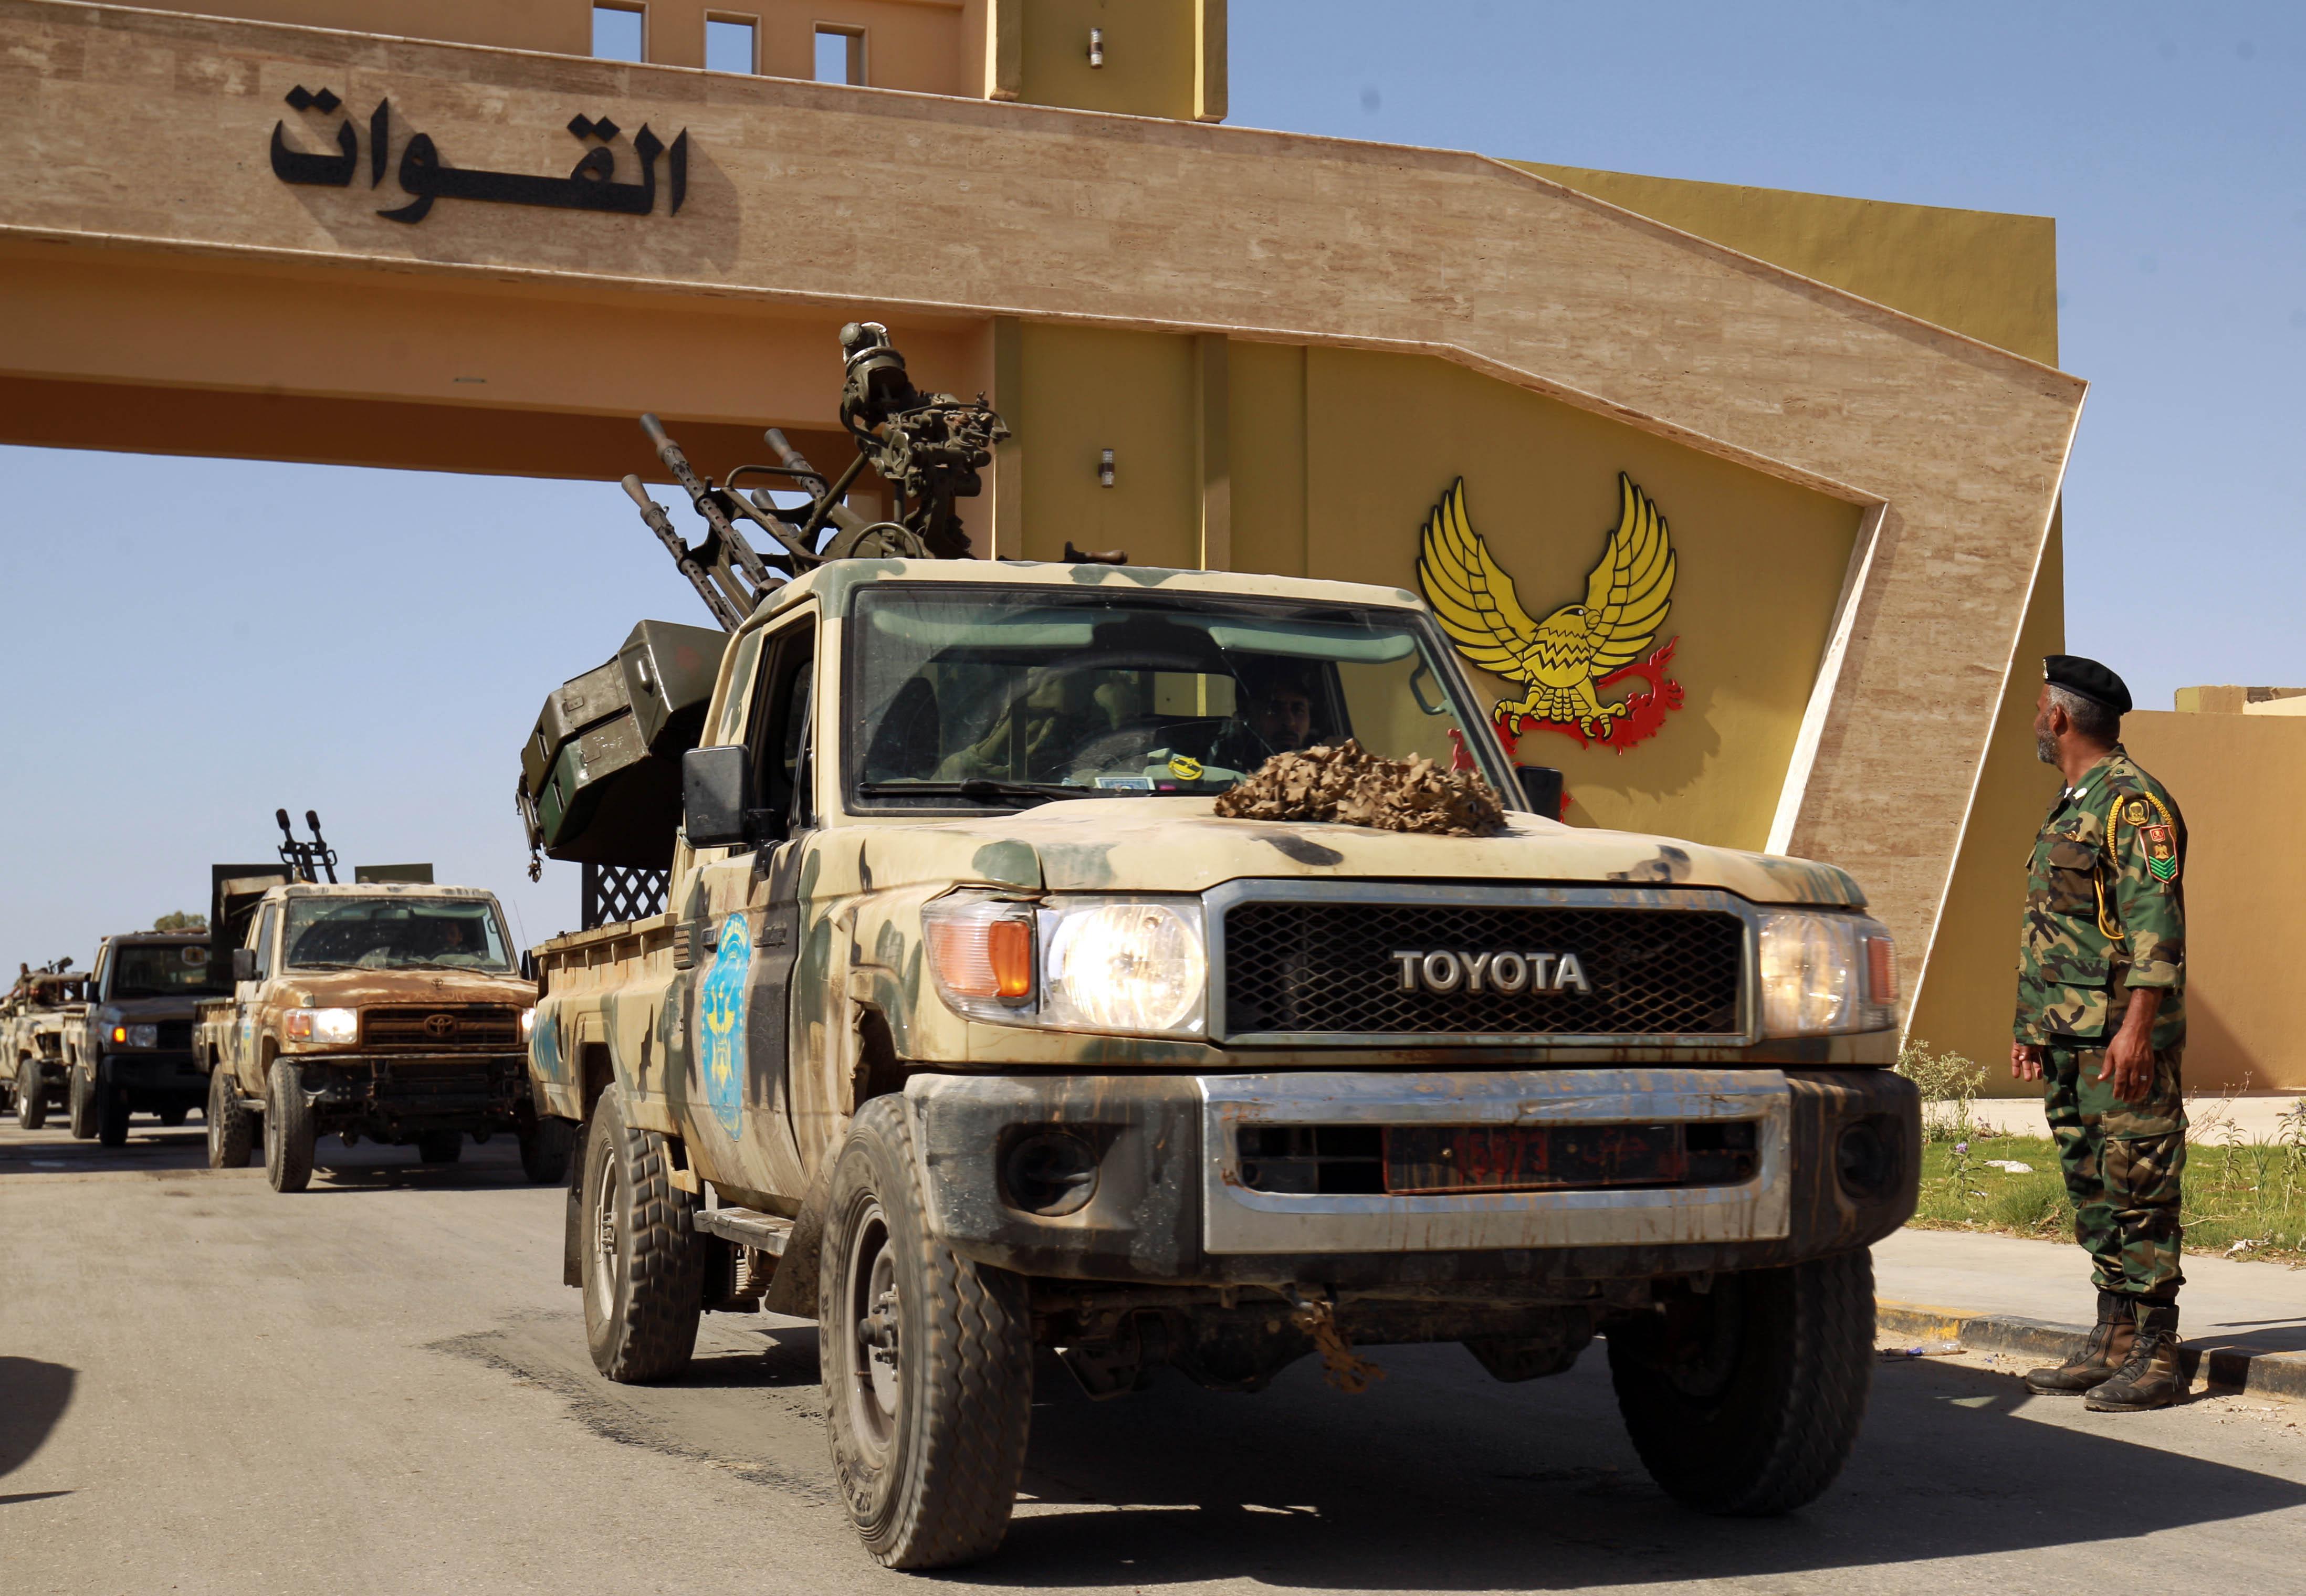 Libyan National Army 'sentences' freelance photojournalist Ismail Abuzreiba al-Zway to 15 years